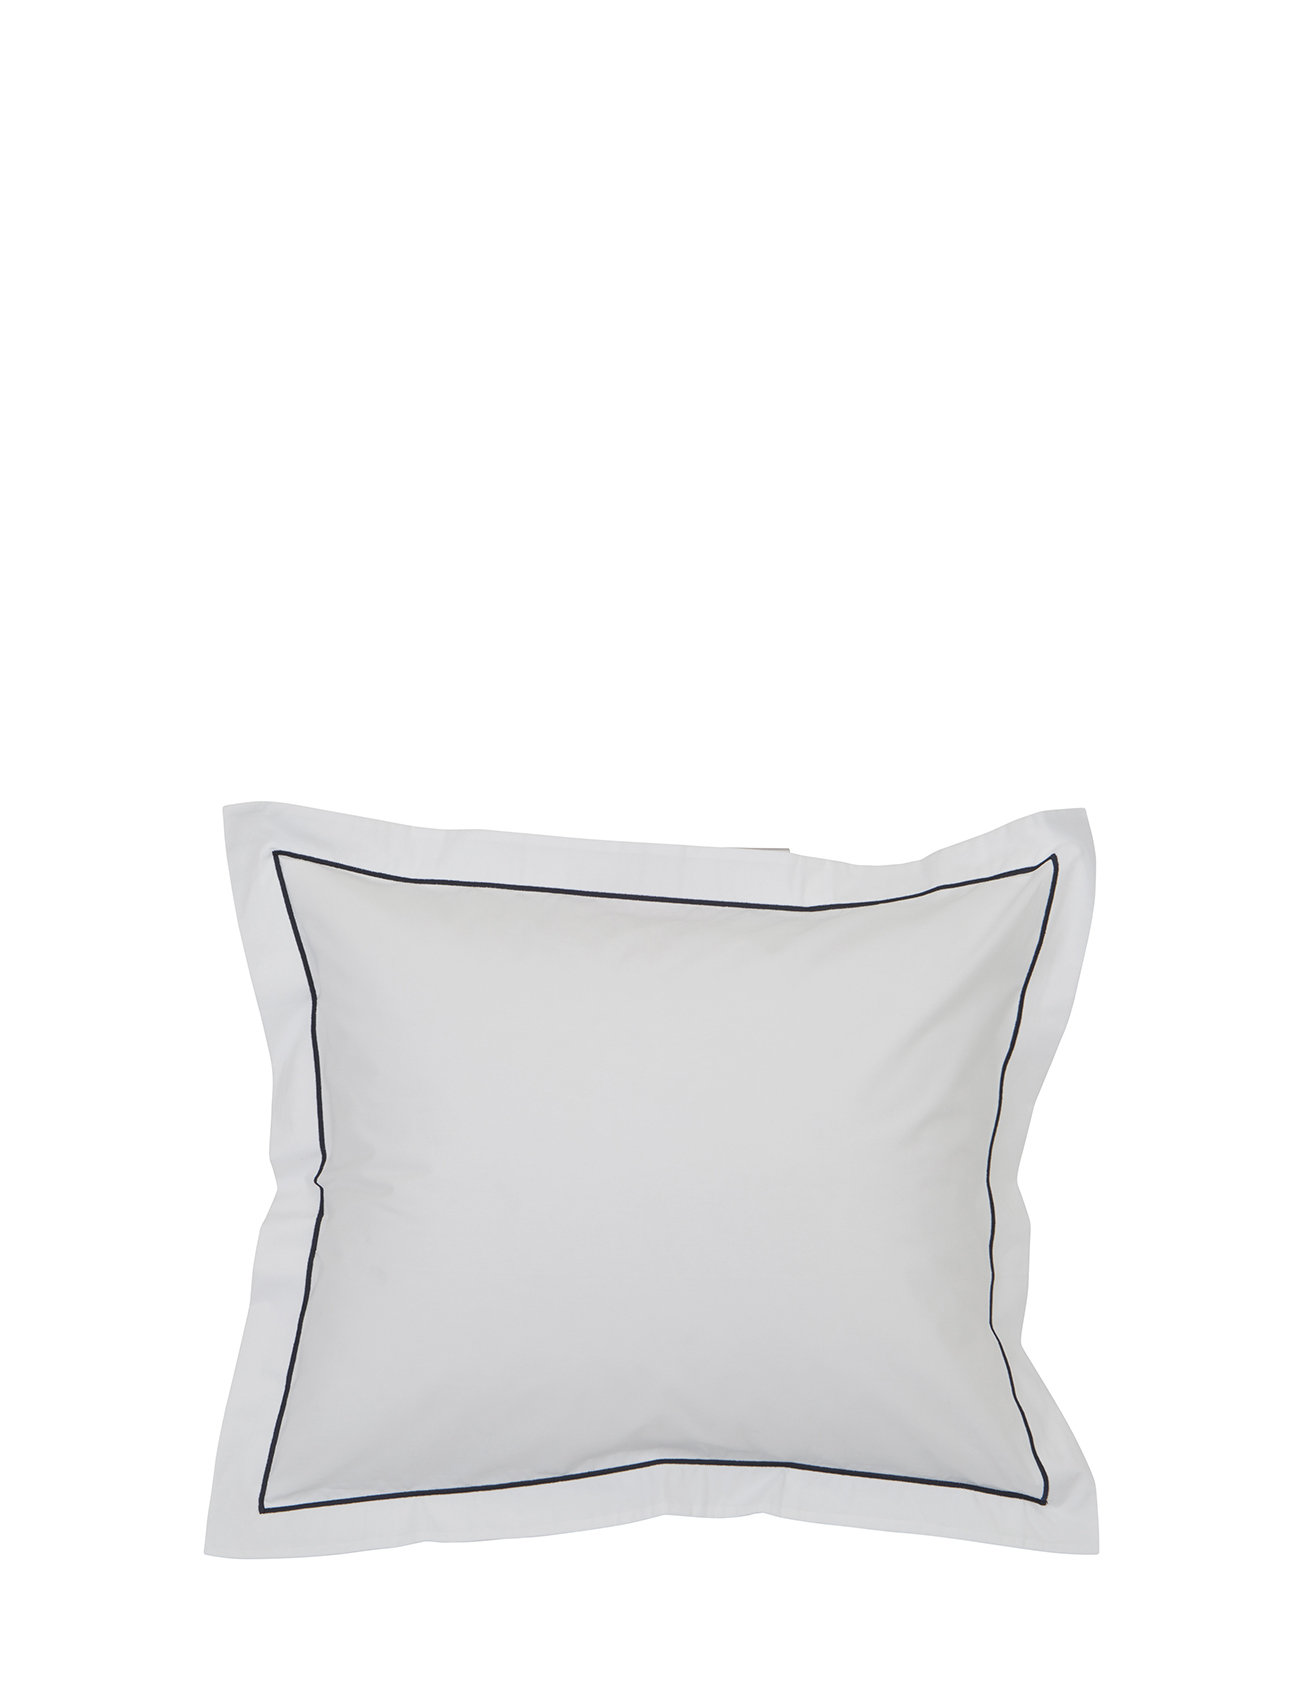 Lexington Home Hotel Percale White/Blue Pillowcase - WHITE/BLUE